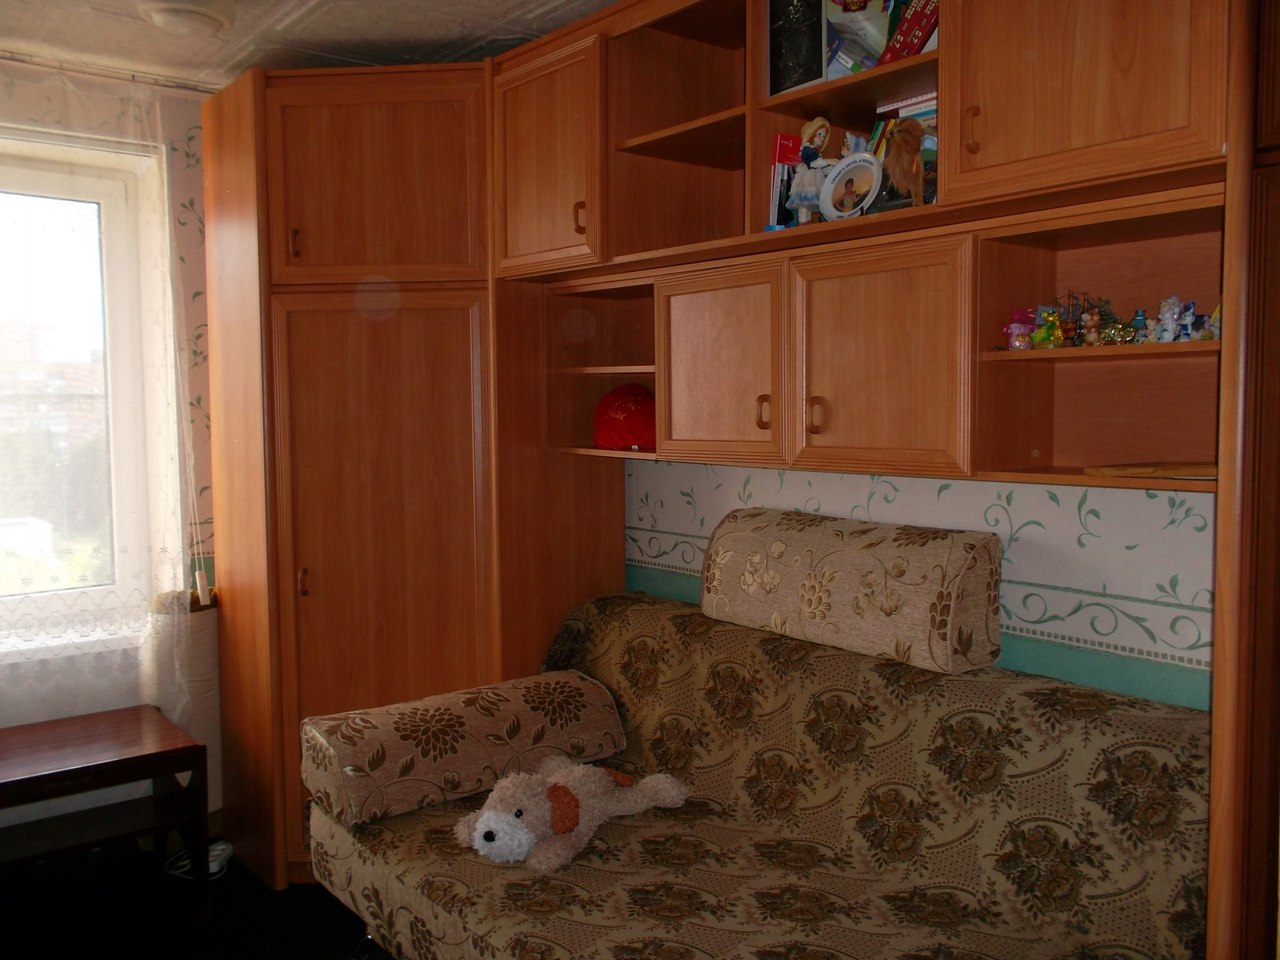 Сдам квартиру в москве за интим услуги 28 фотография